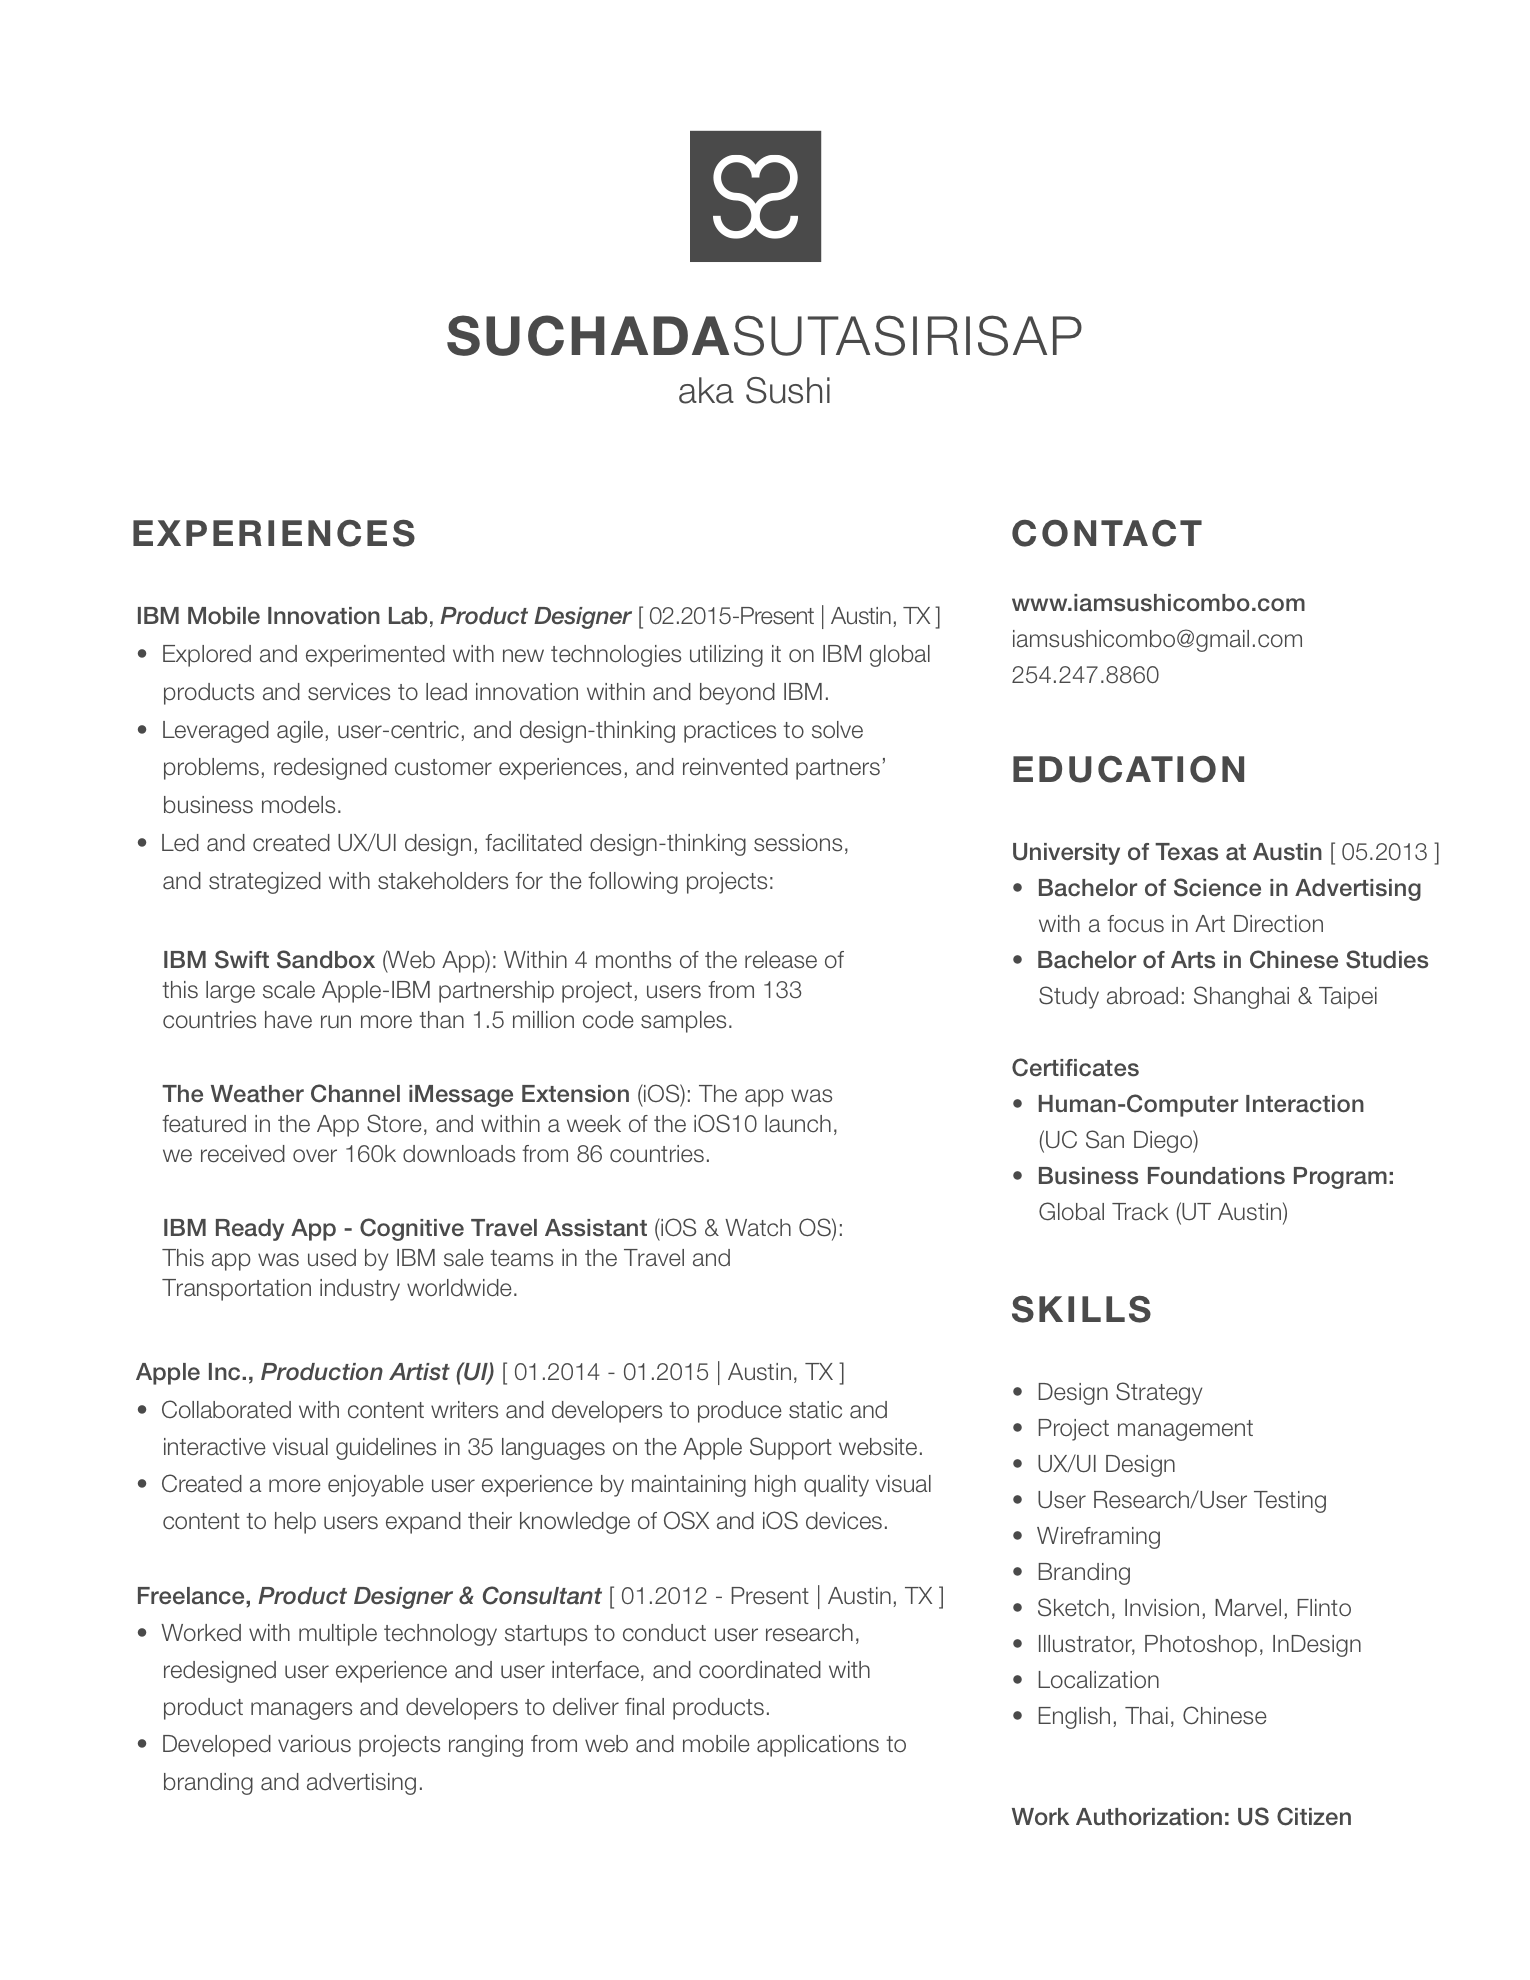 sushi s portfolio website resume resume 2017 new